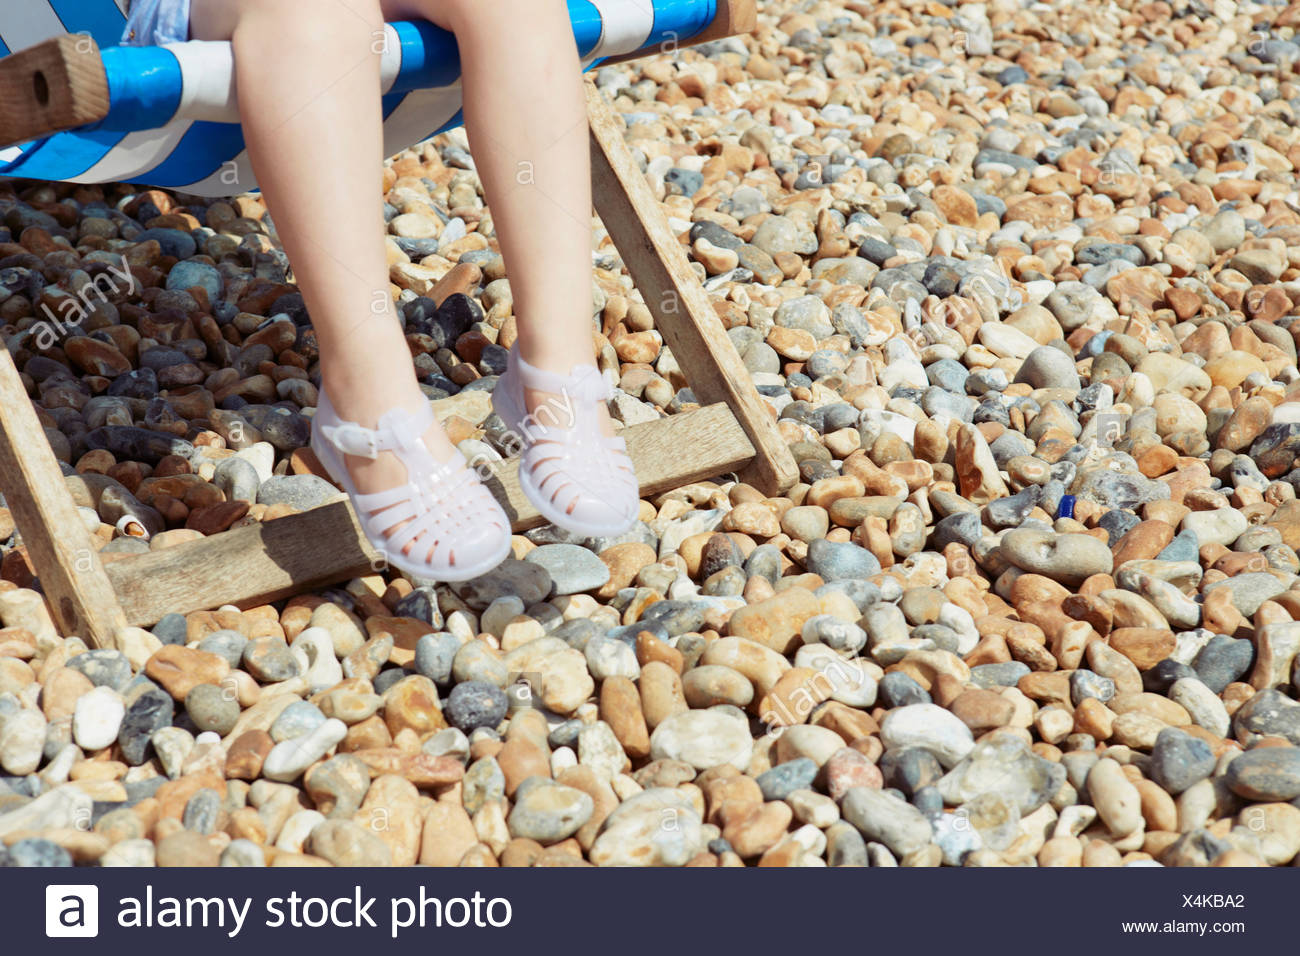 Kind mit Kunststoff-Sandalen auf Strand Liegestuhl Stockbild